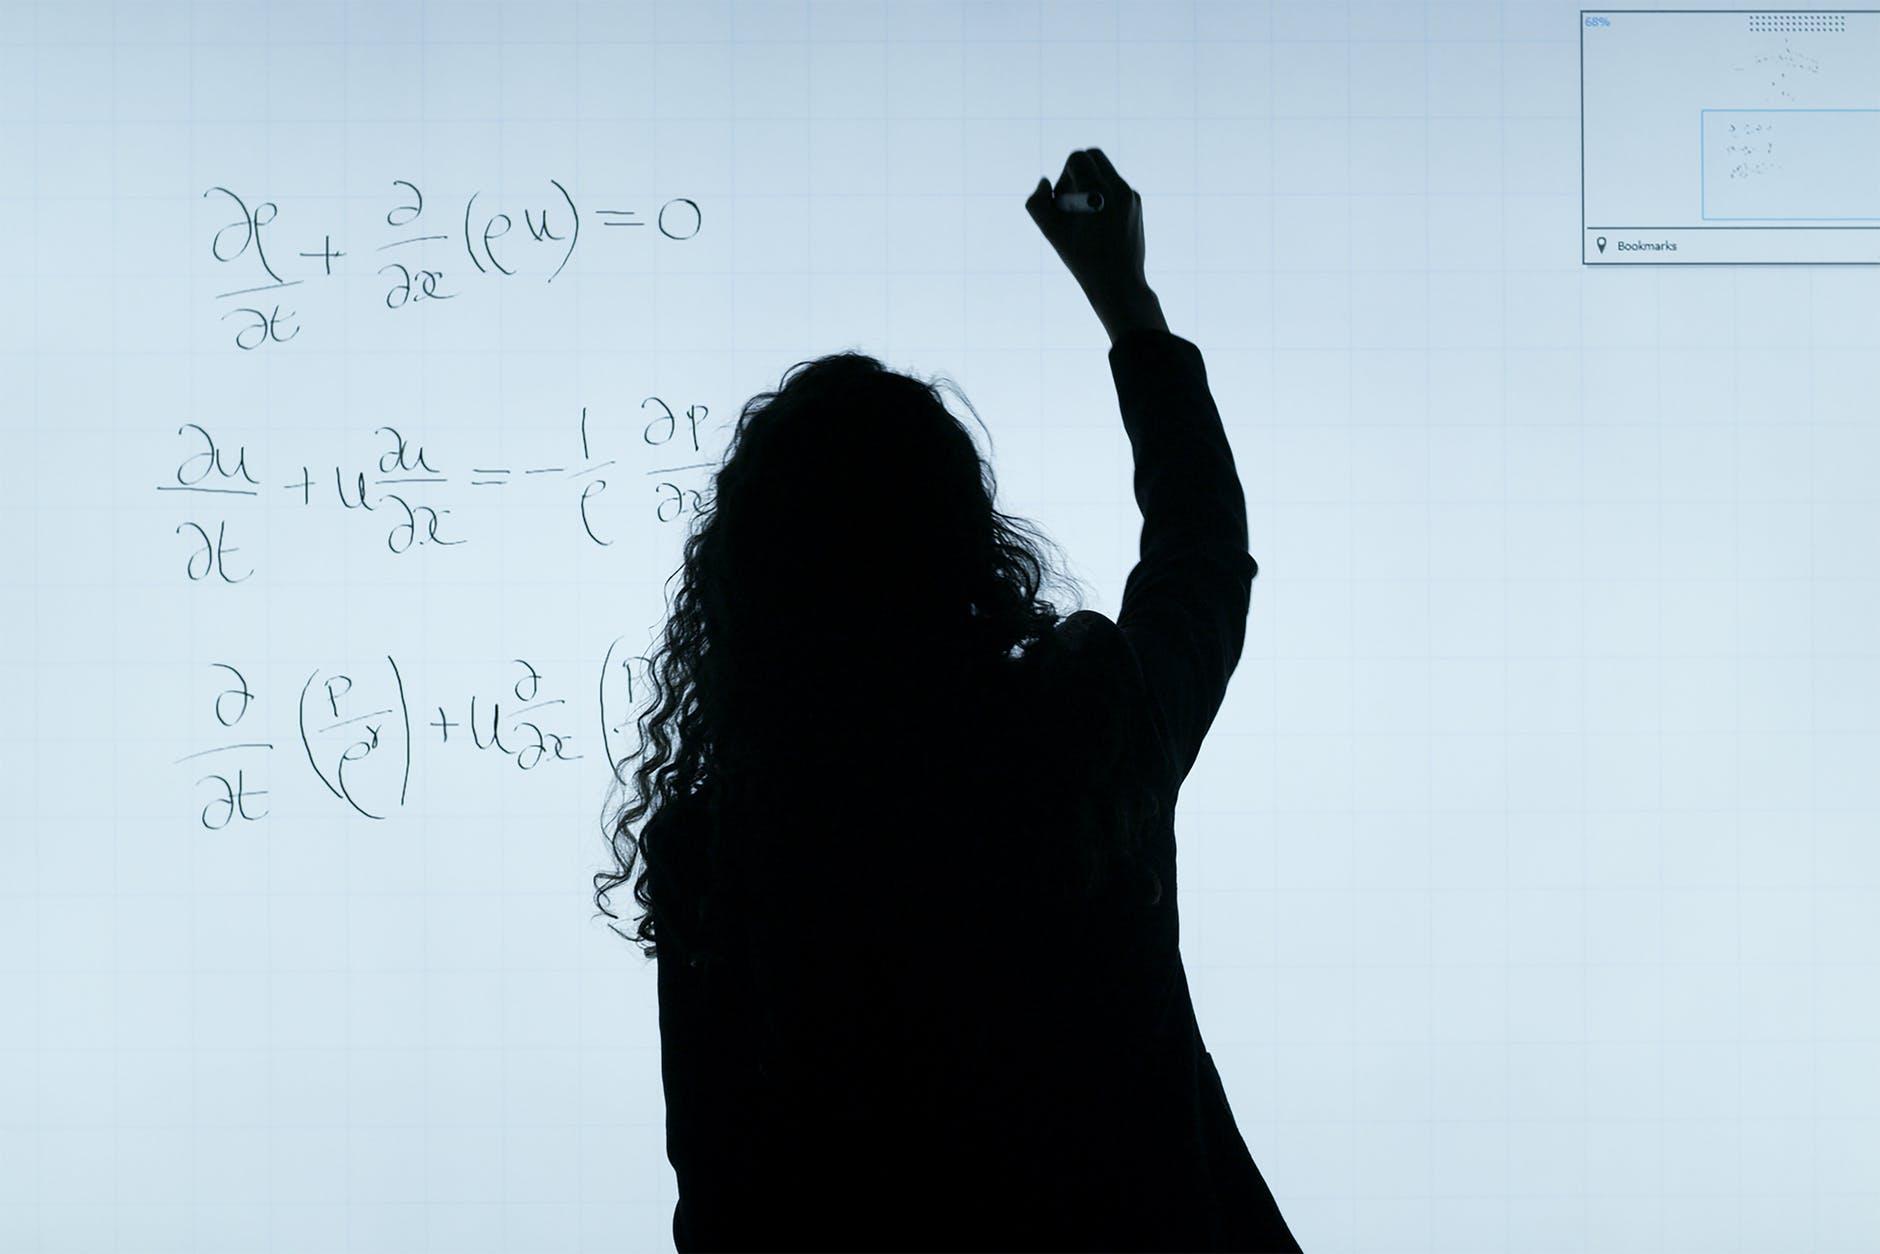 woman writing equations